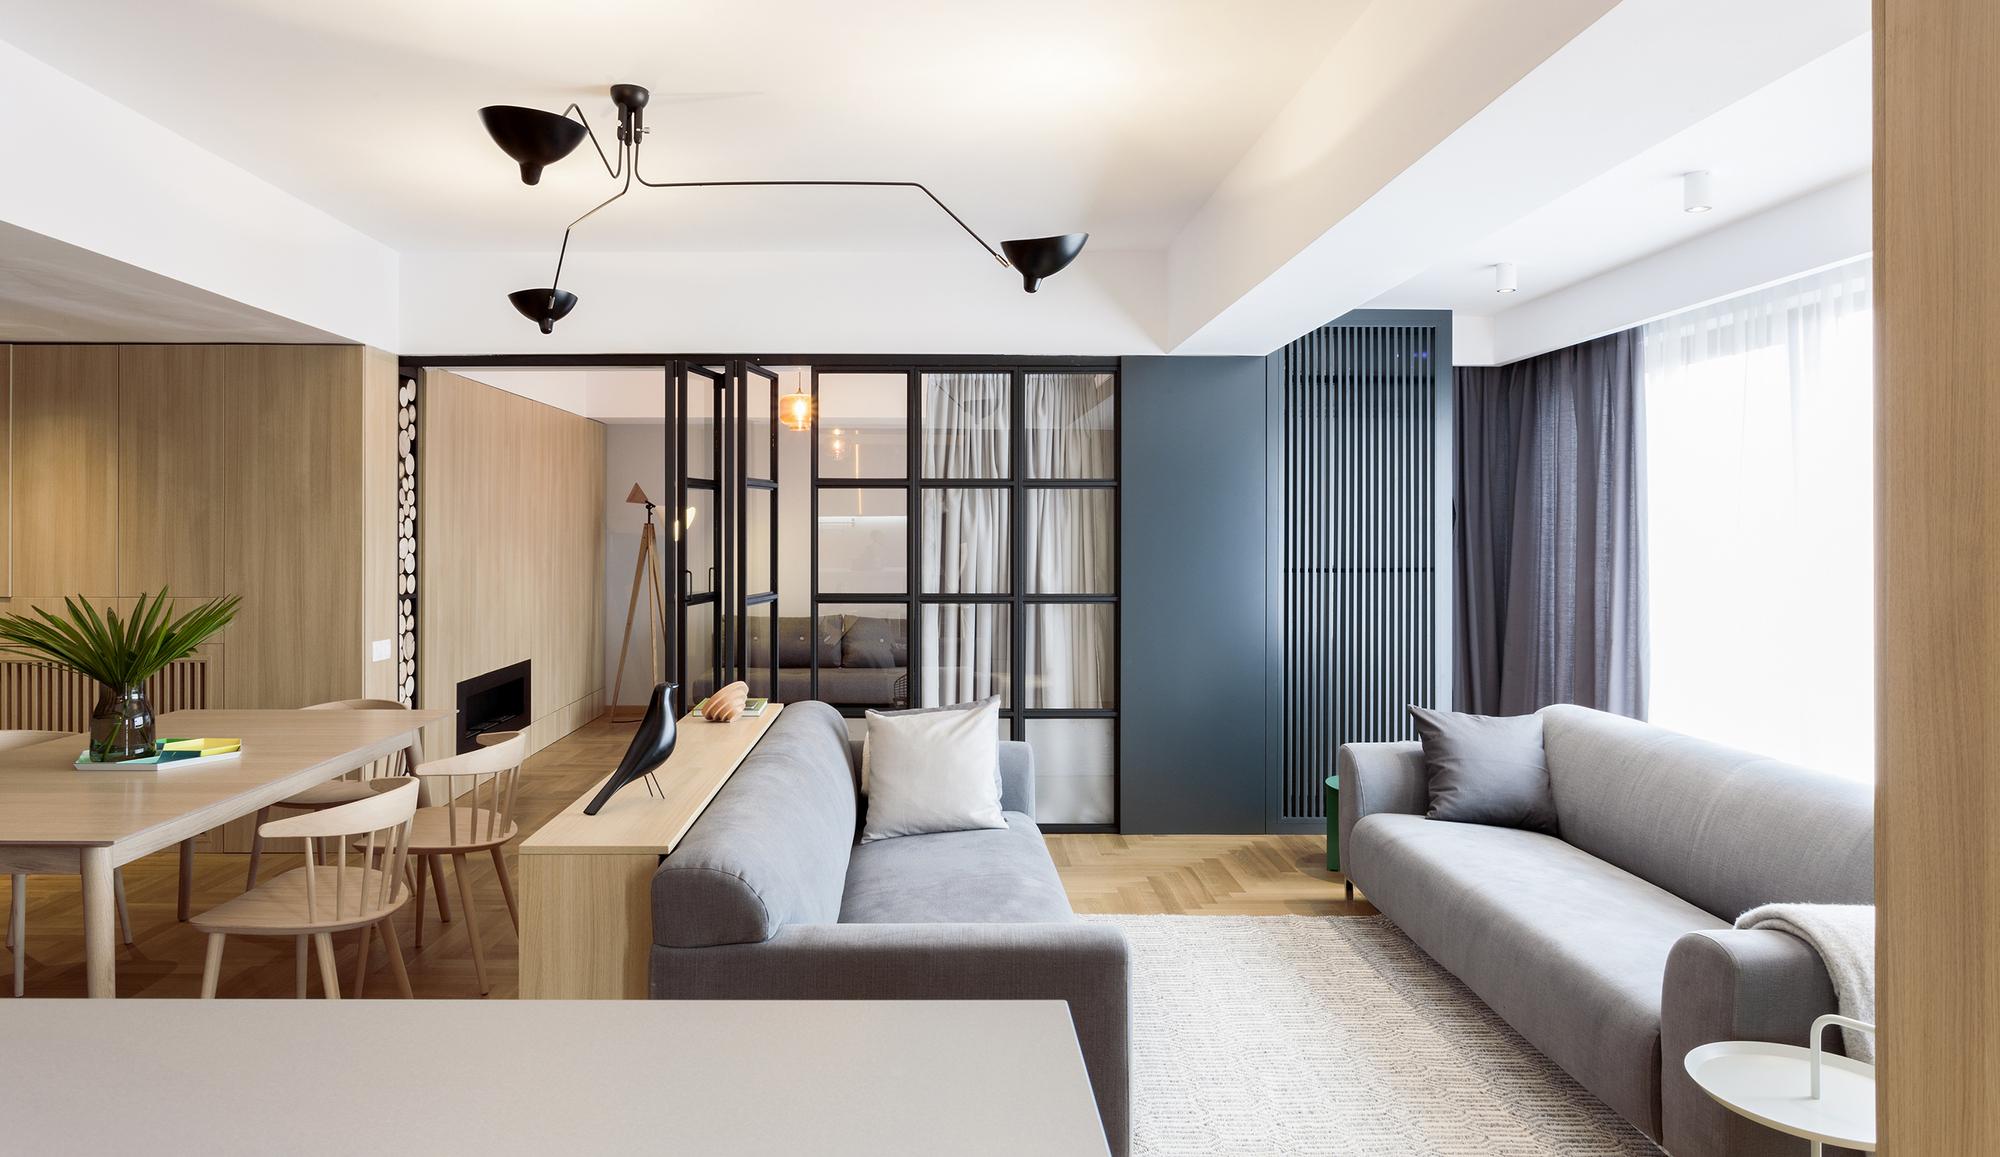 Apartment in bucharest rosu ciocodeica archdaily for Bucharest apartments